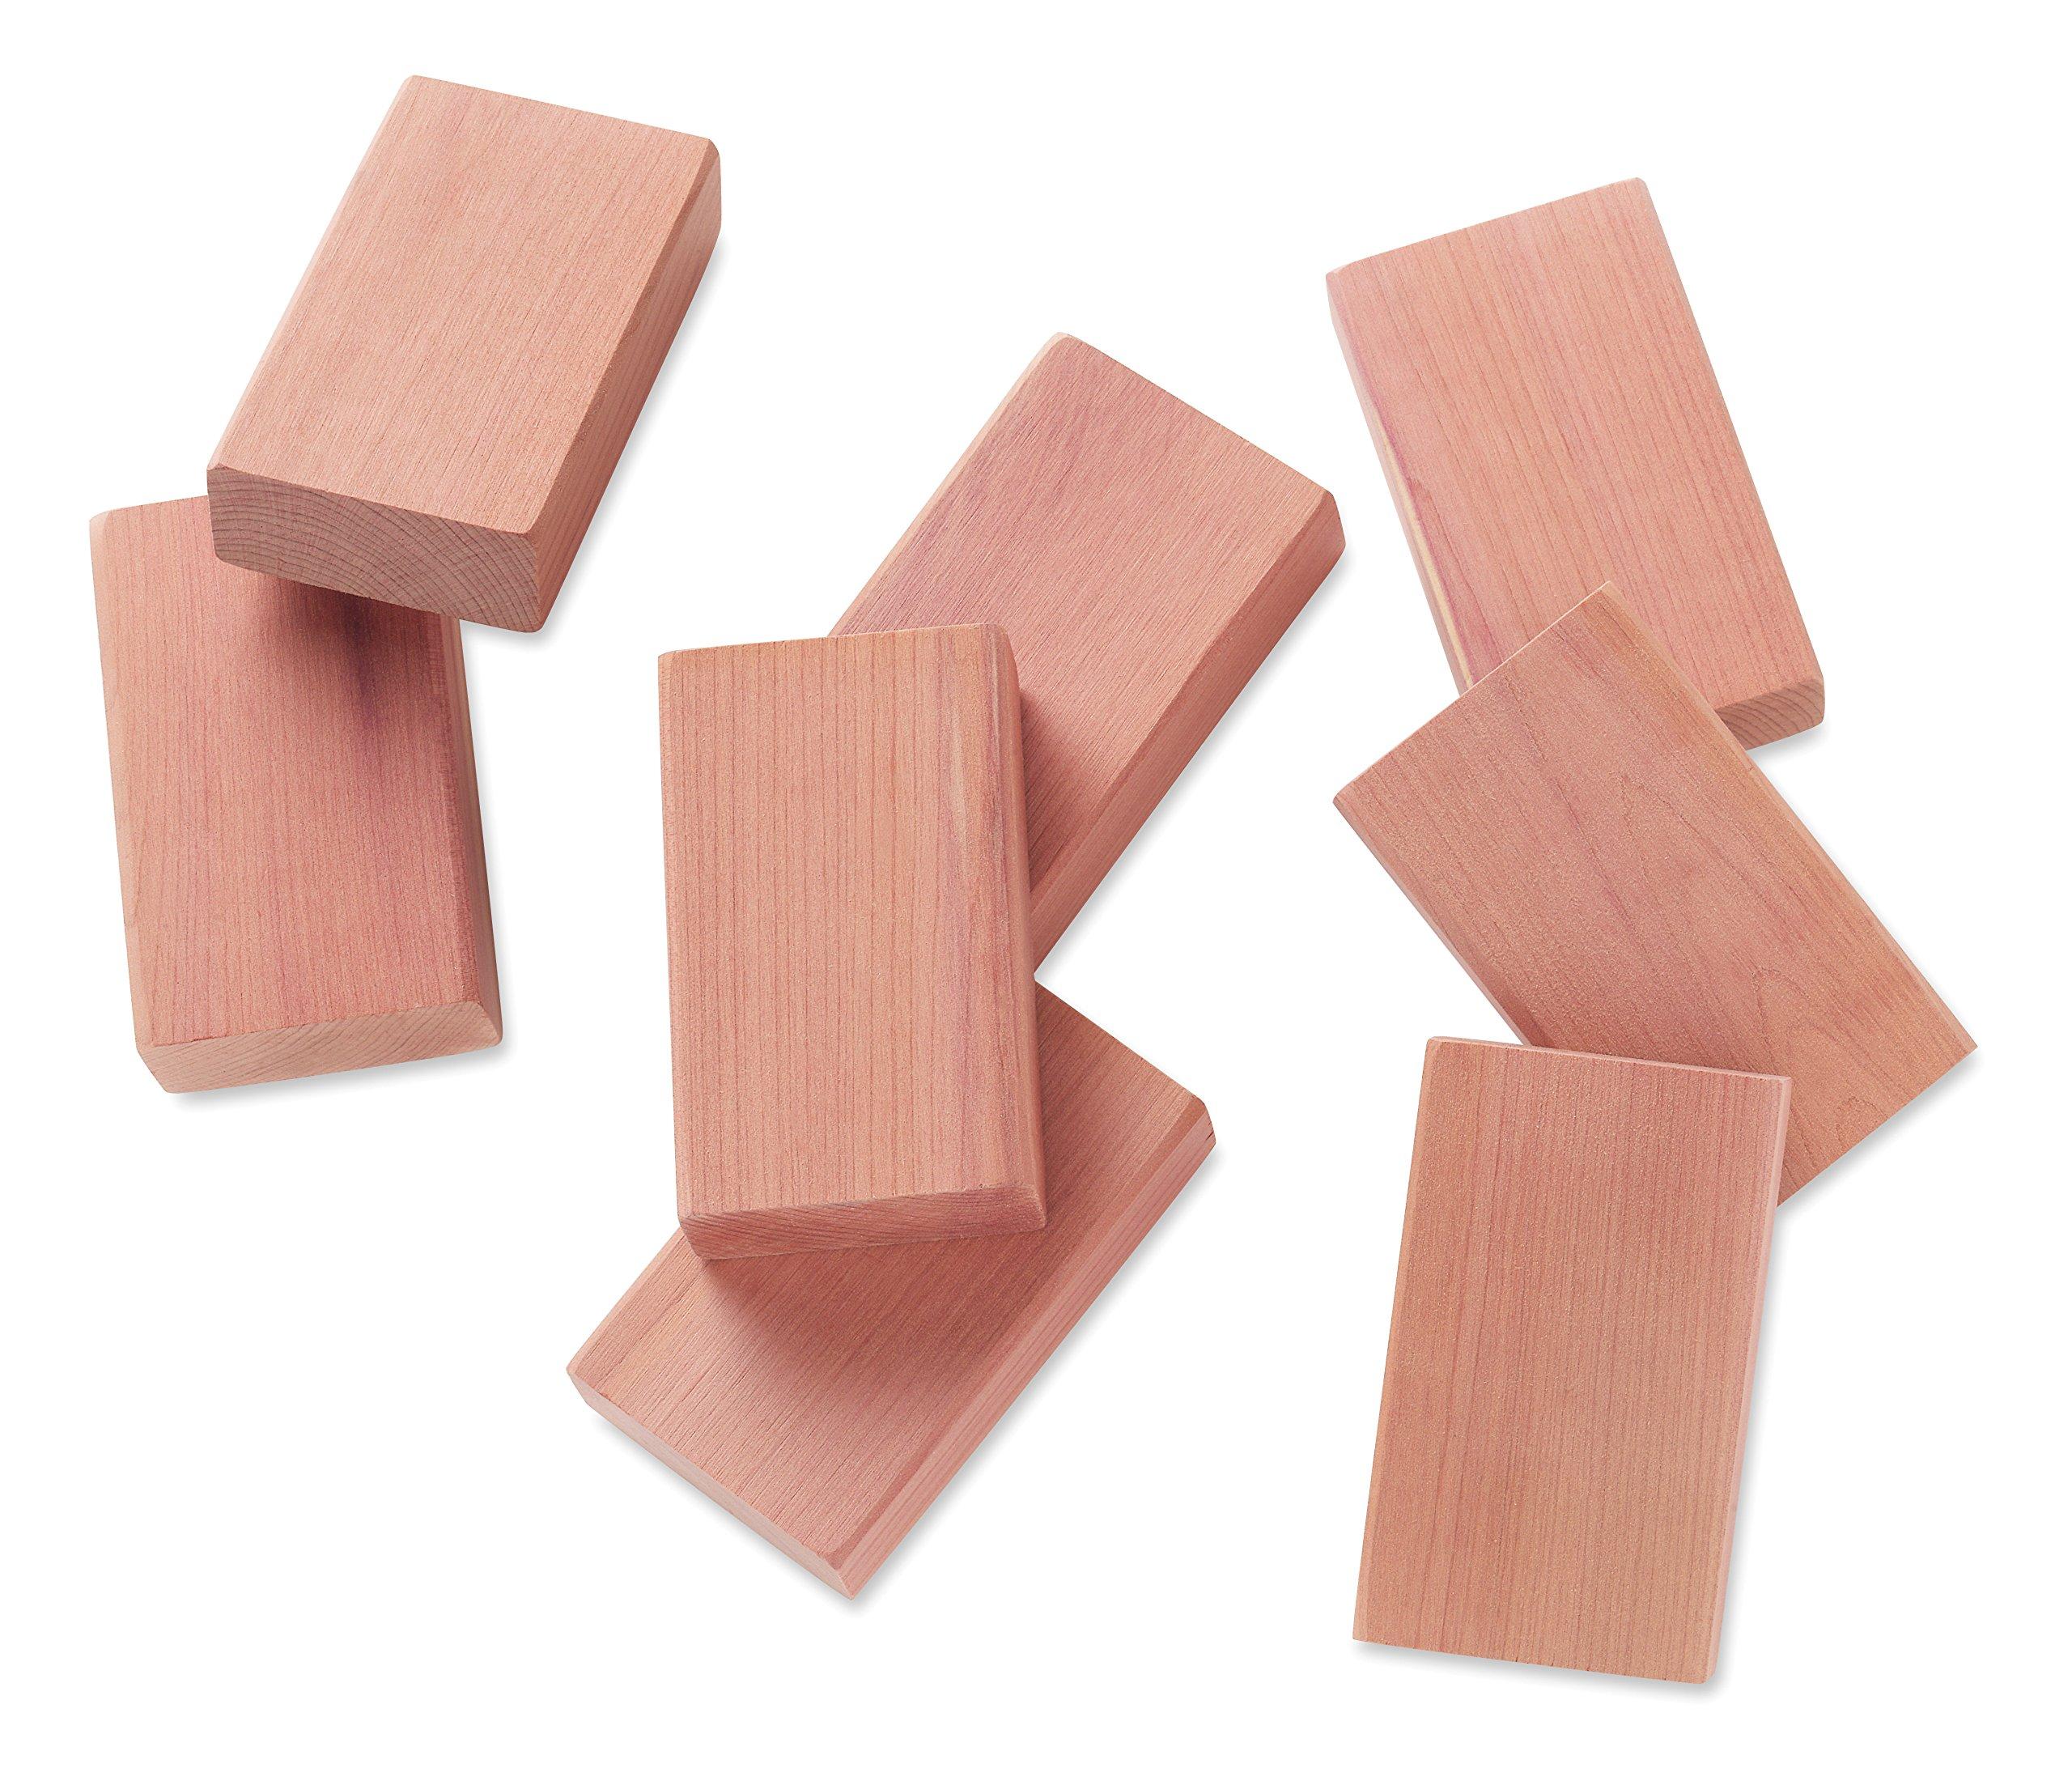 Whitmor Aromatic Cedar Blocks-S/8